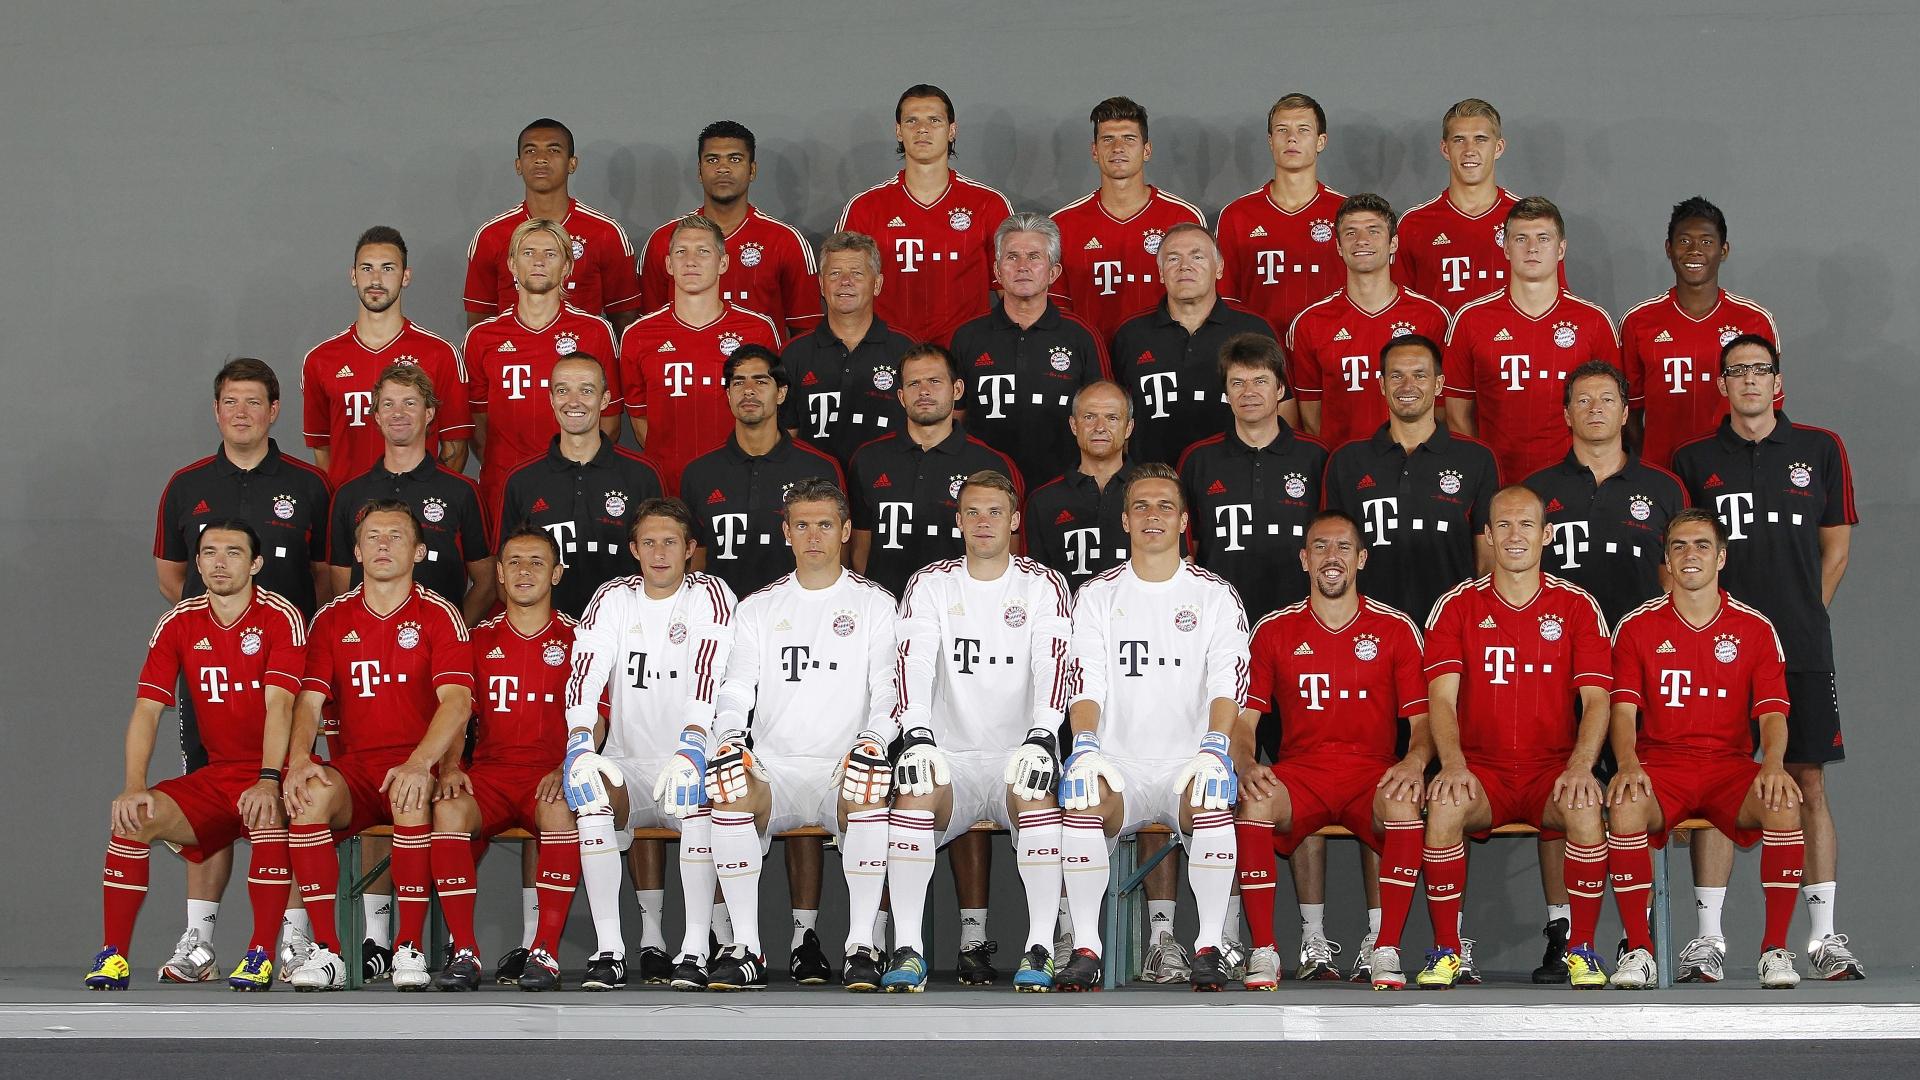 Players of fc bayern munchen team wallpaper download 1920x1080 voltagebd Images